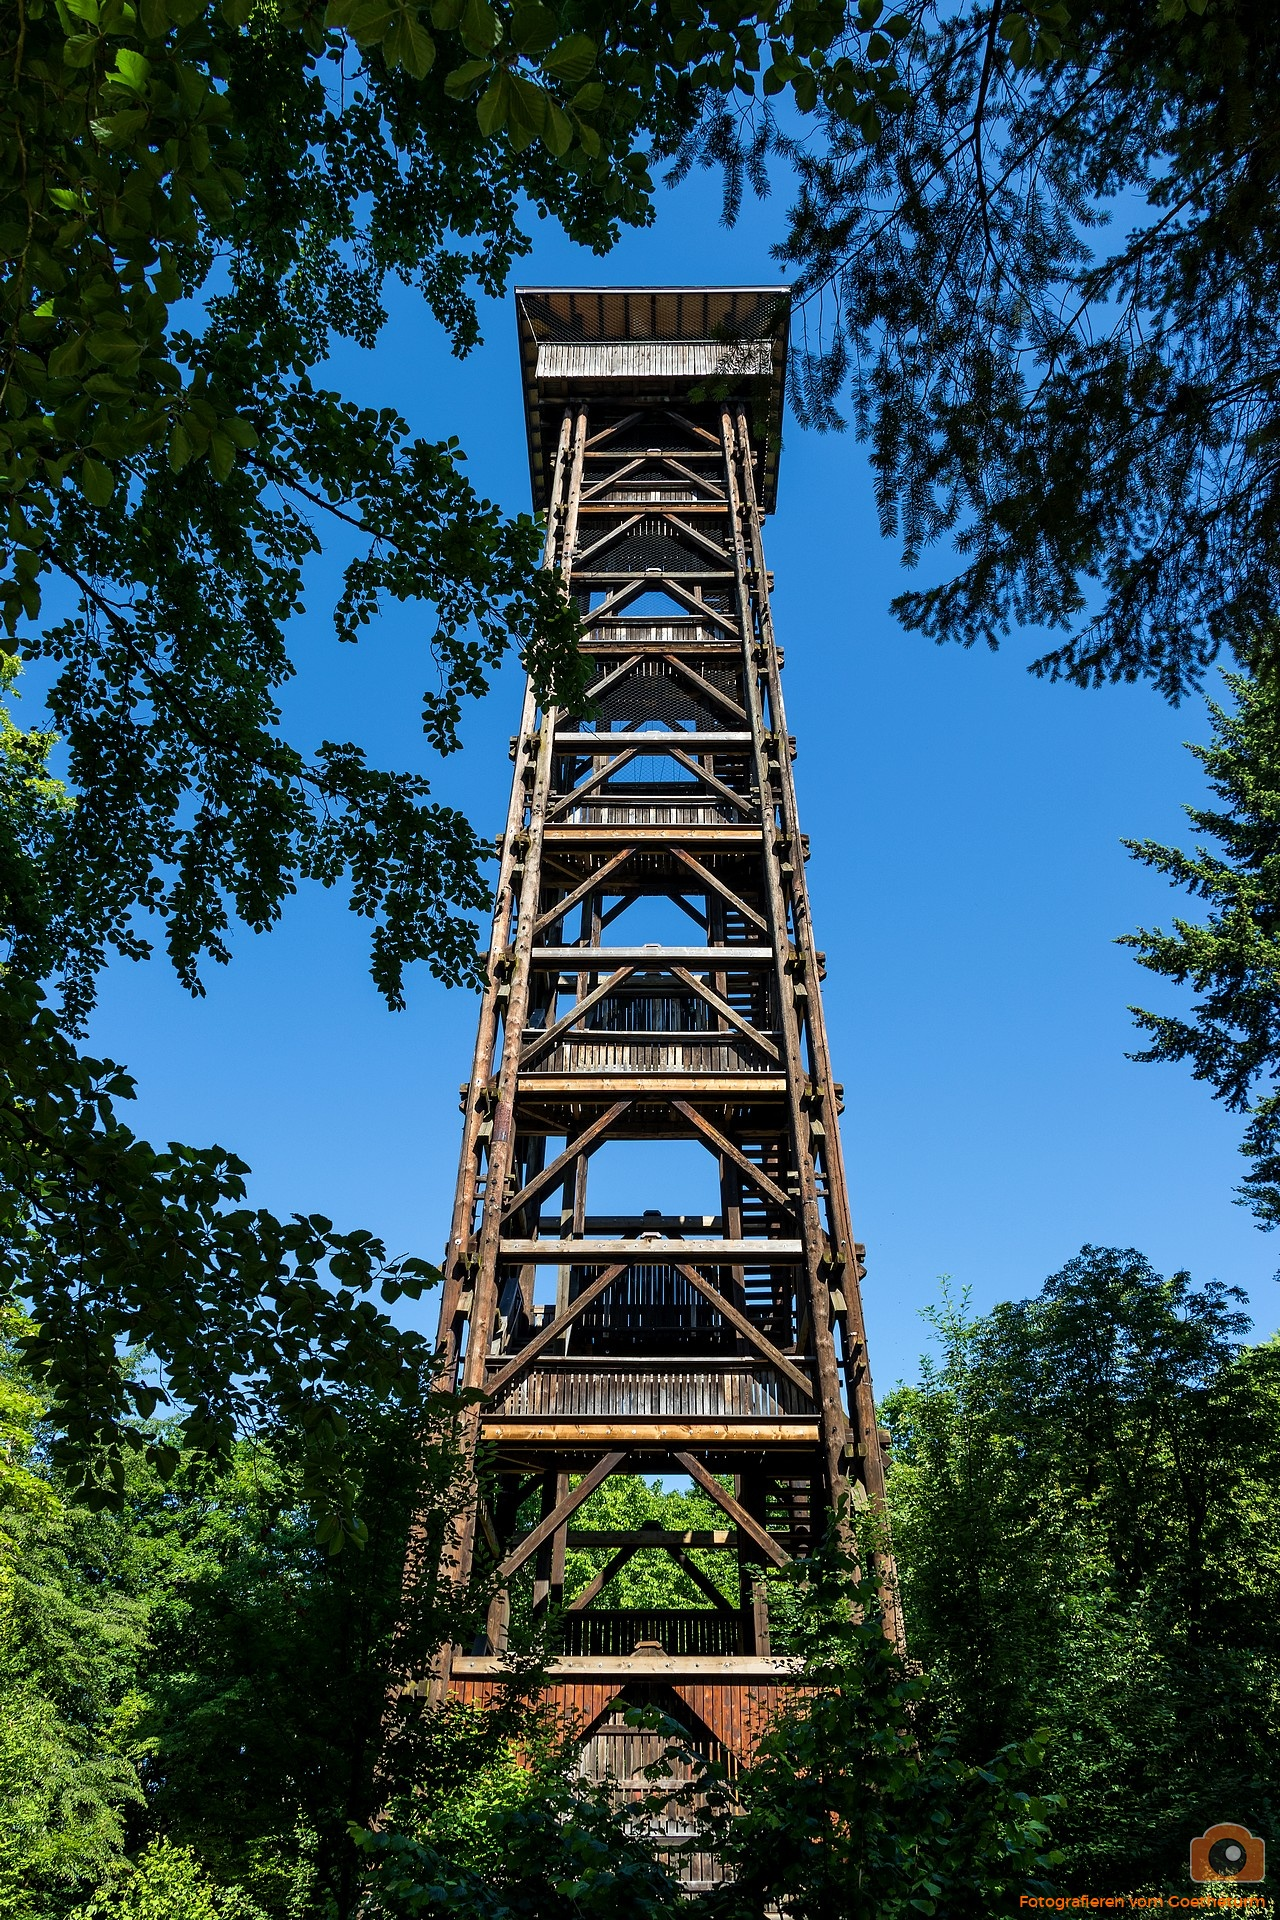 Goethe Turm